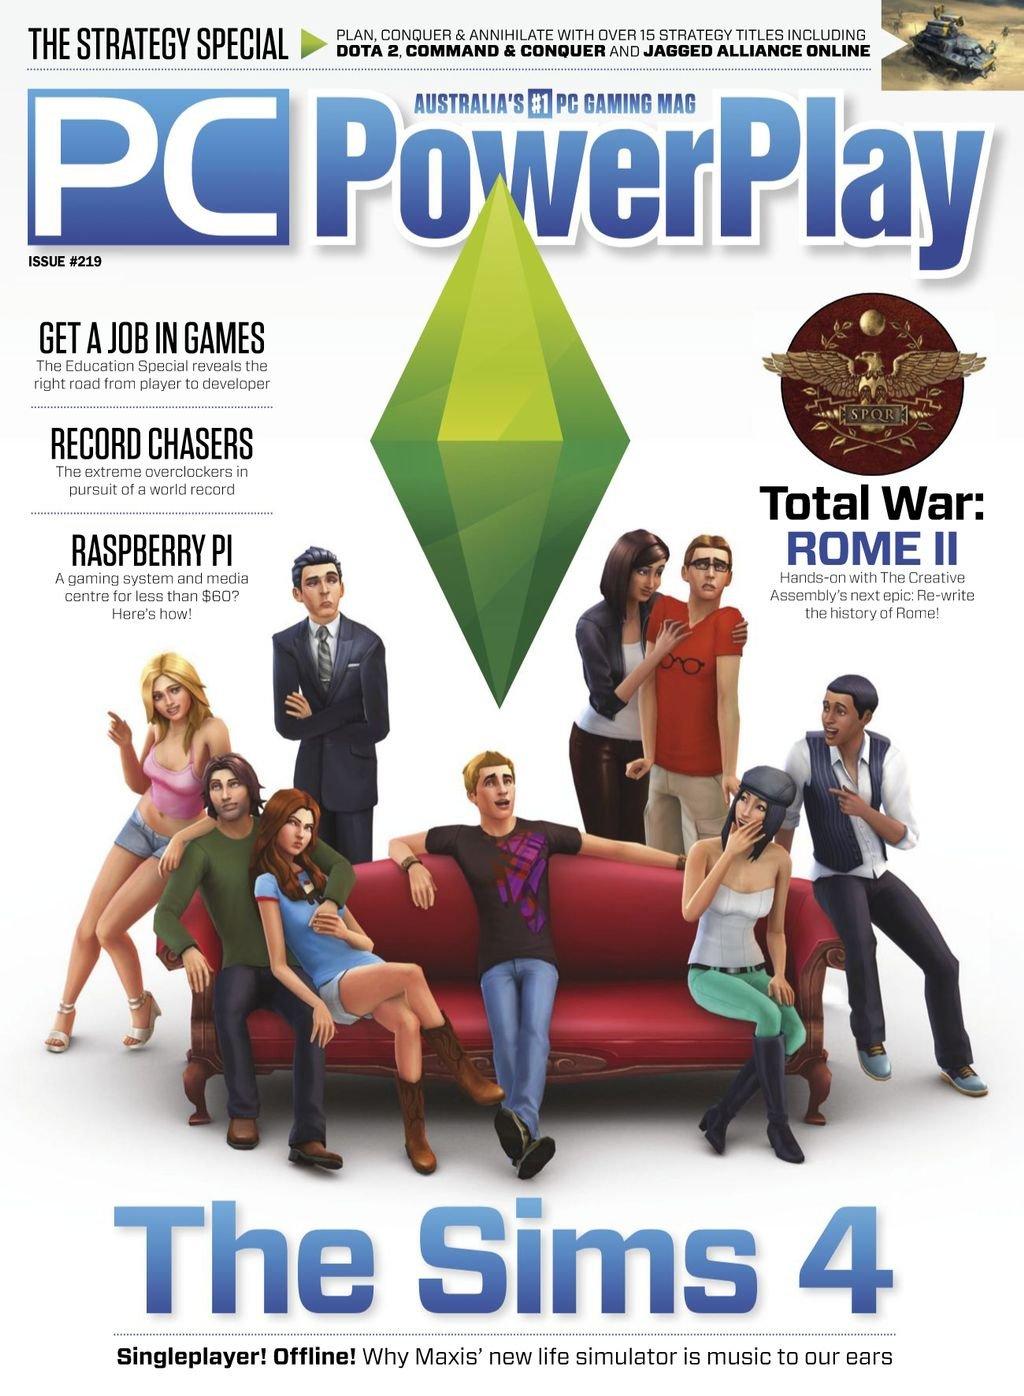 PC Powerplay 219 (September 2013)